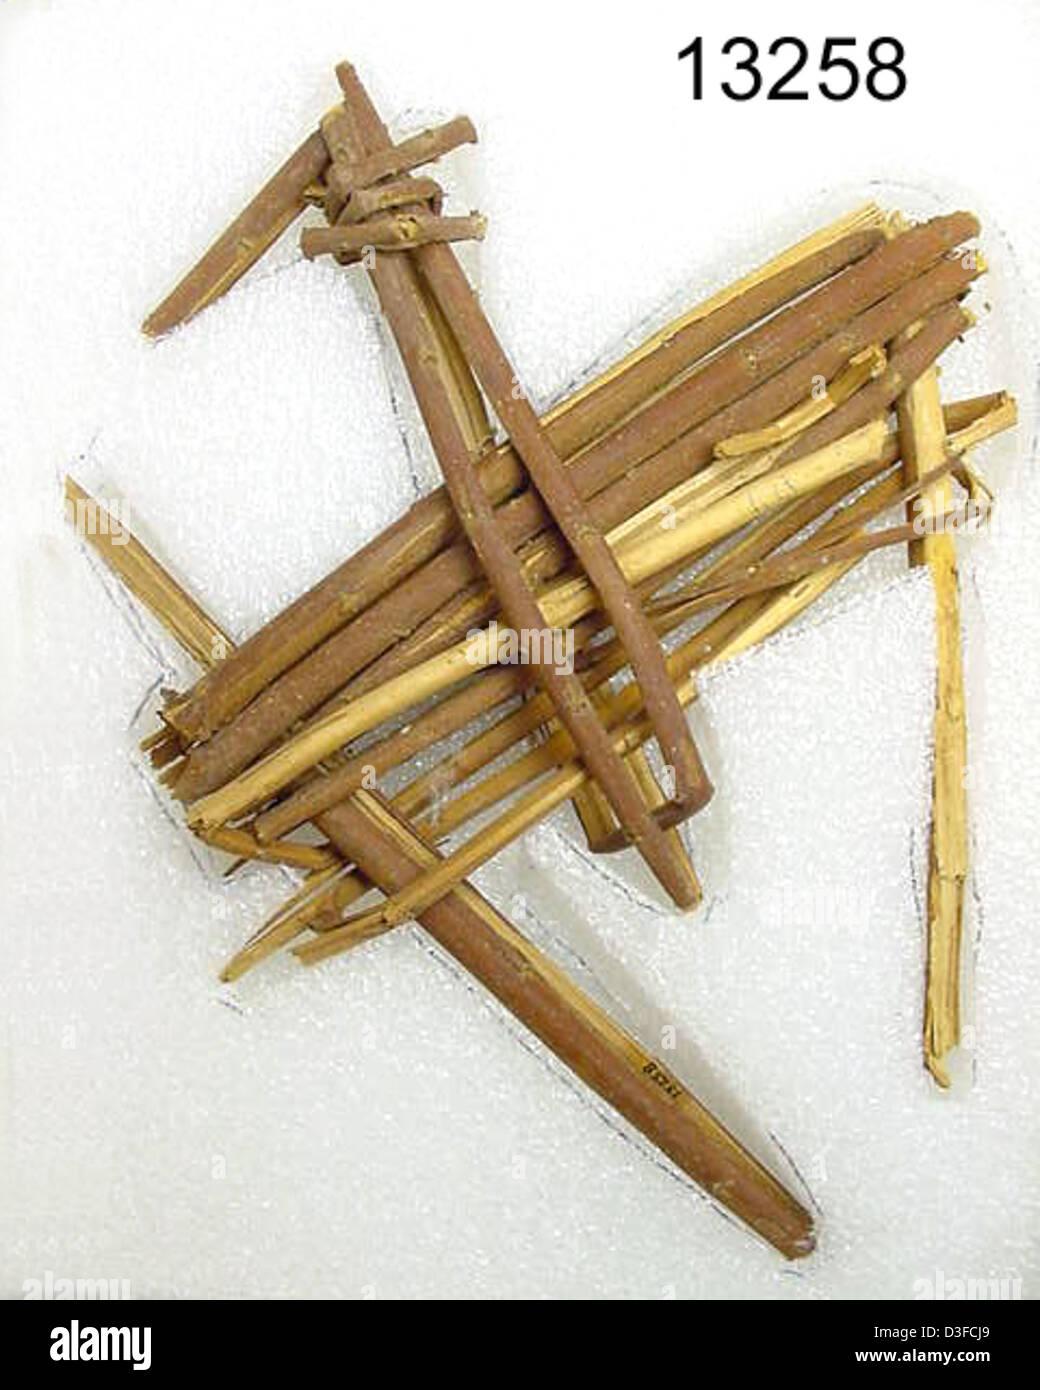 13258 Grand Canyon_Split-Twig Figurine - Stock Image